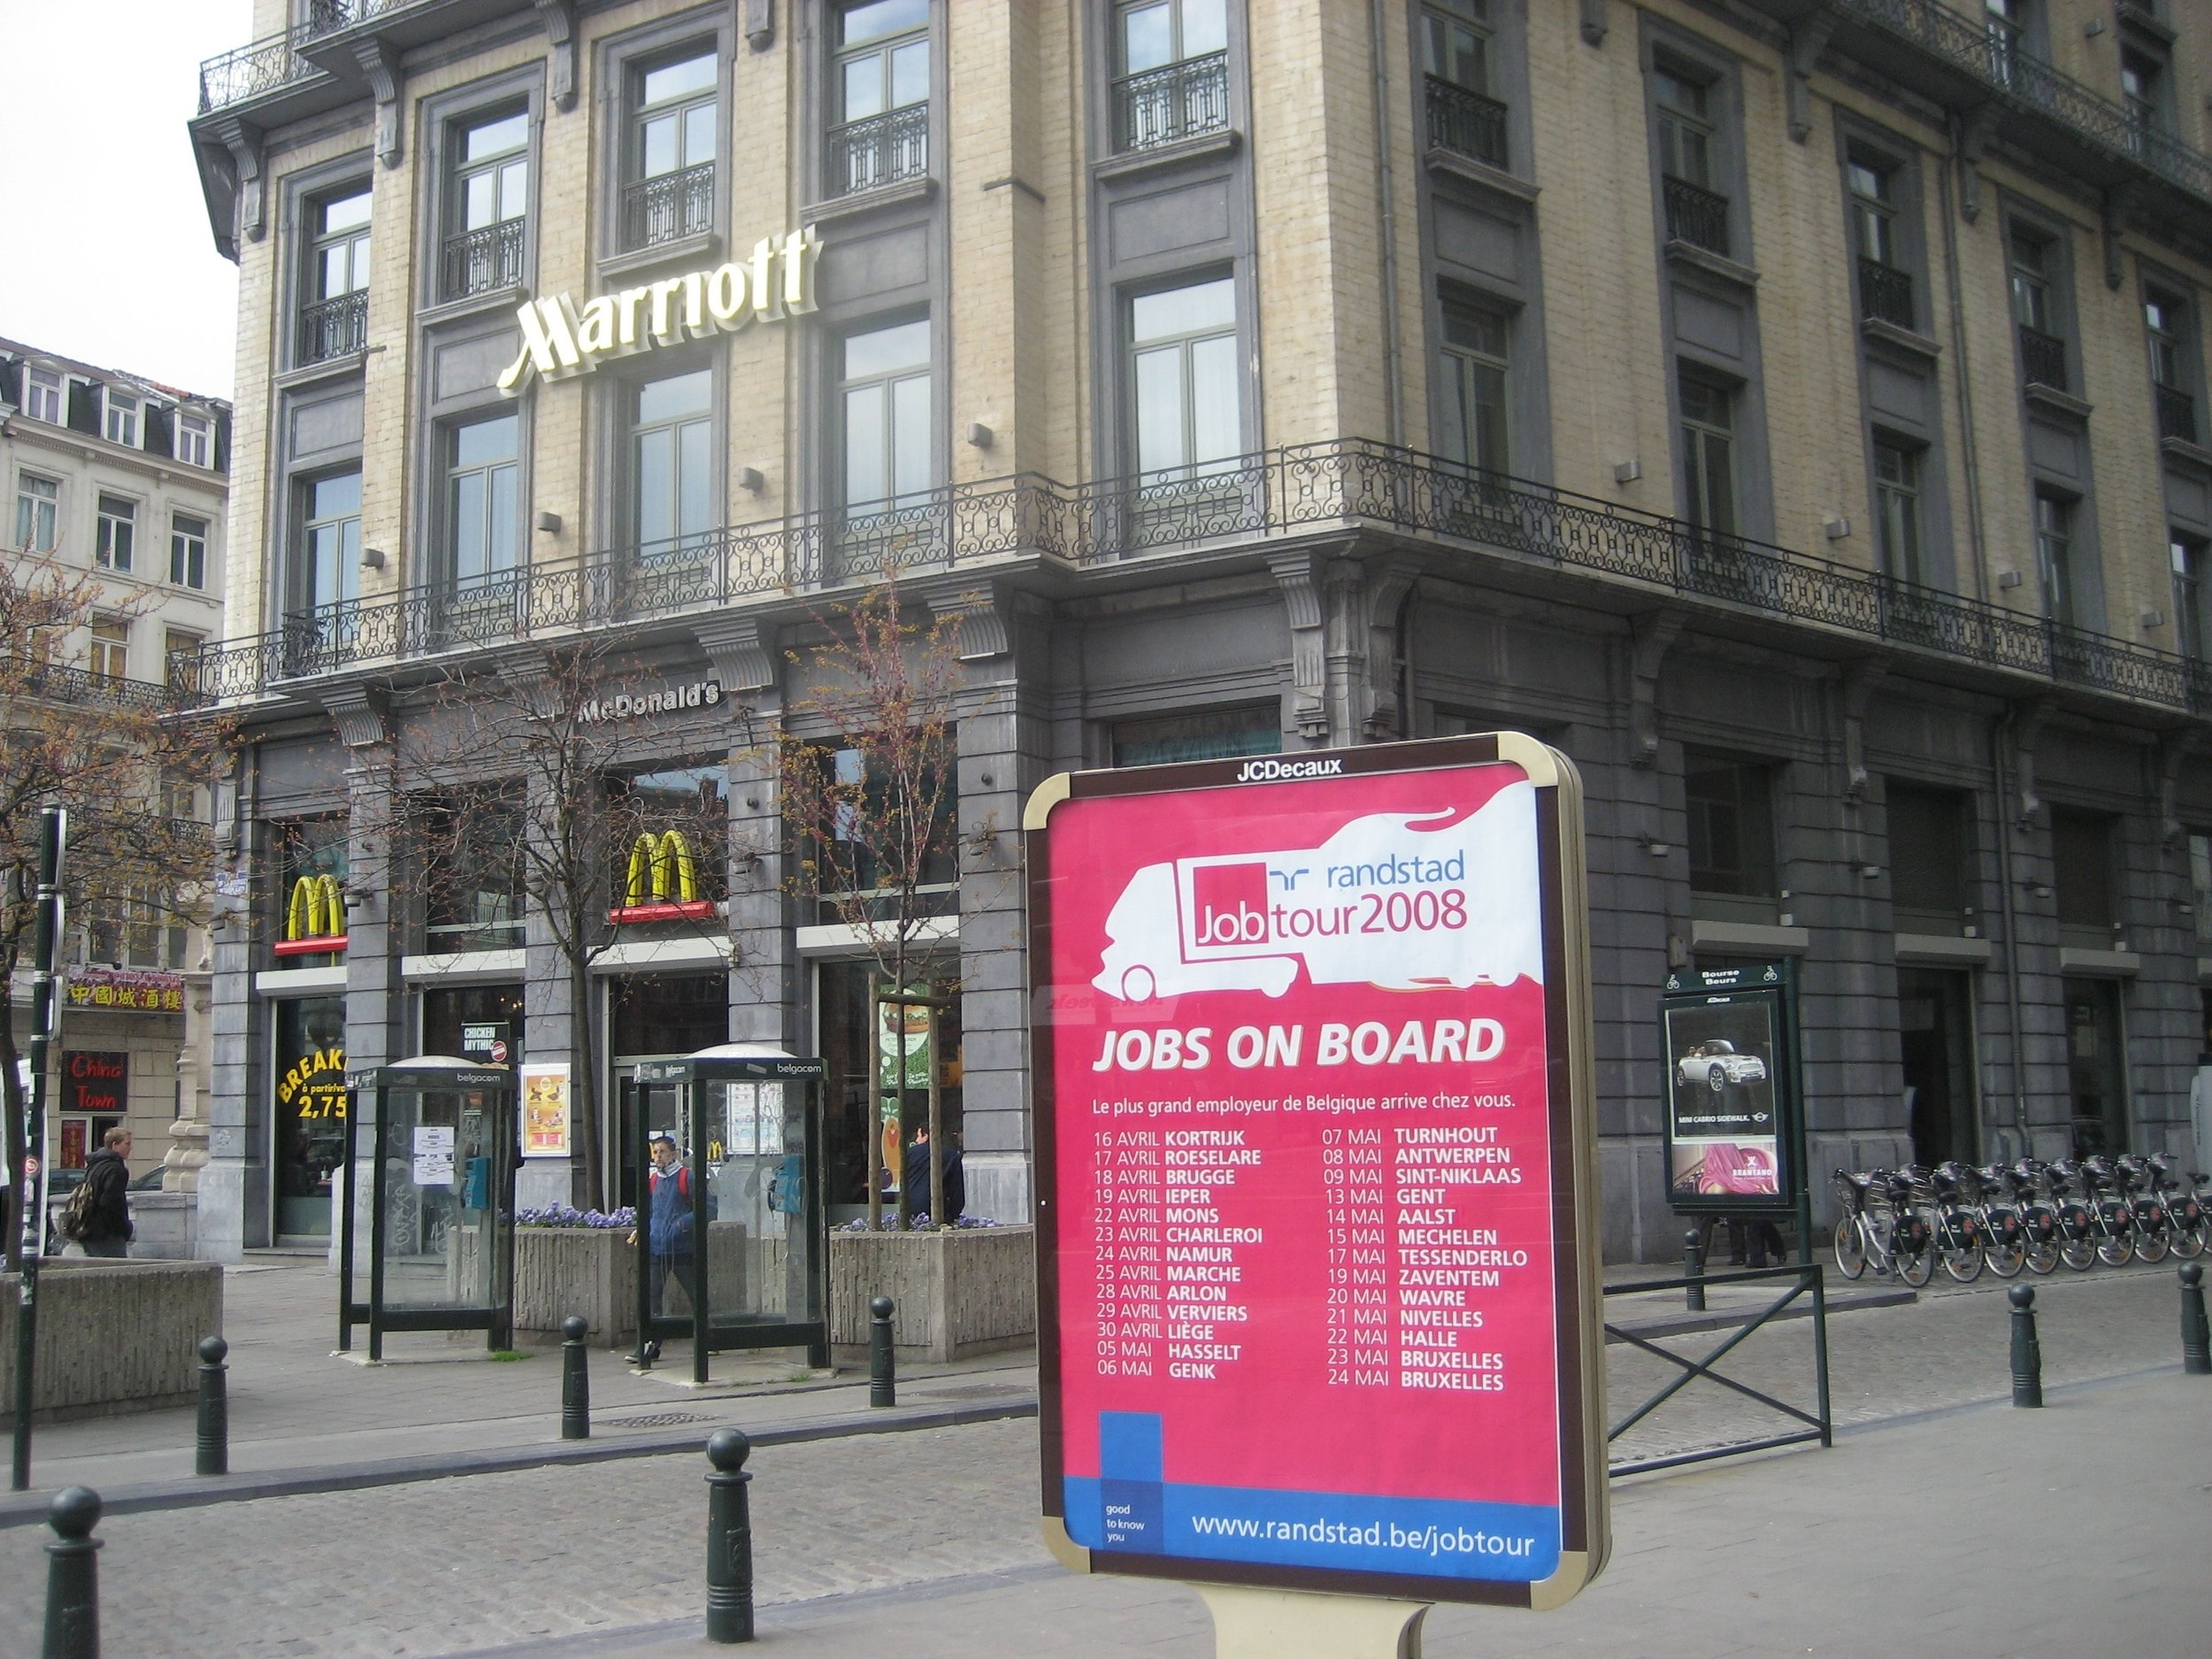 jobtour1.jpg